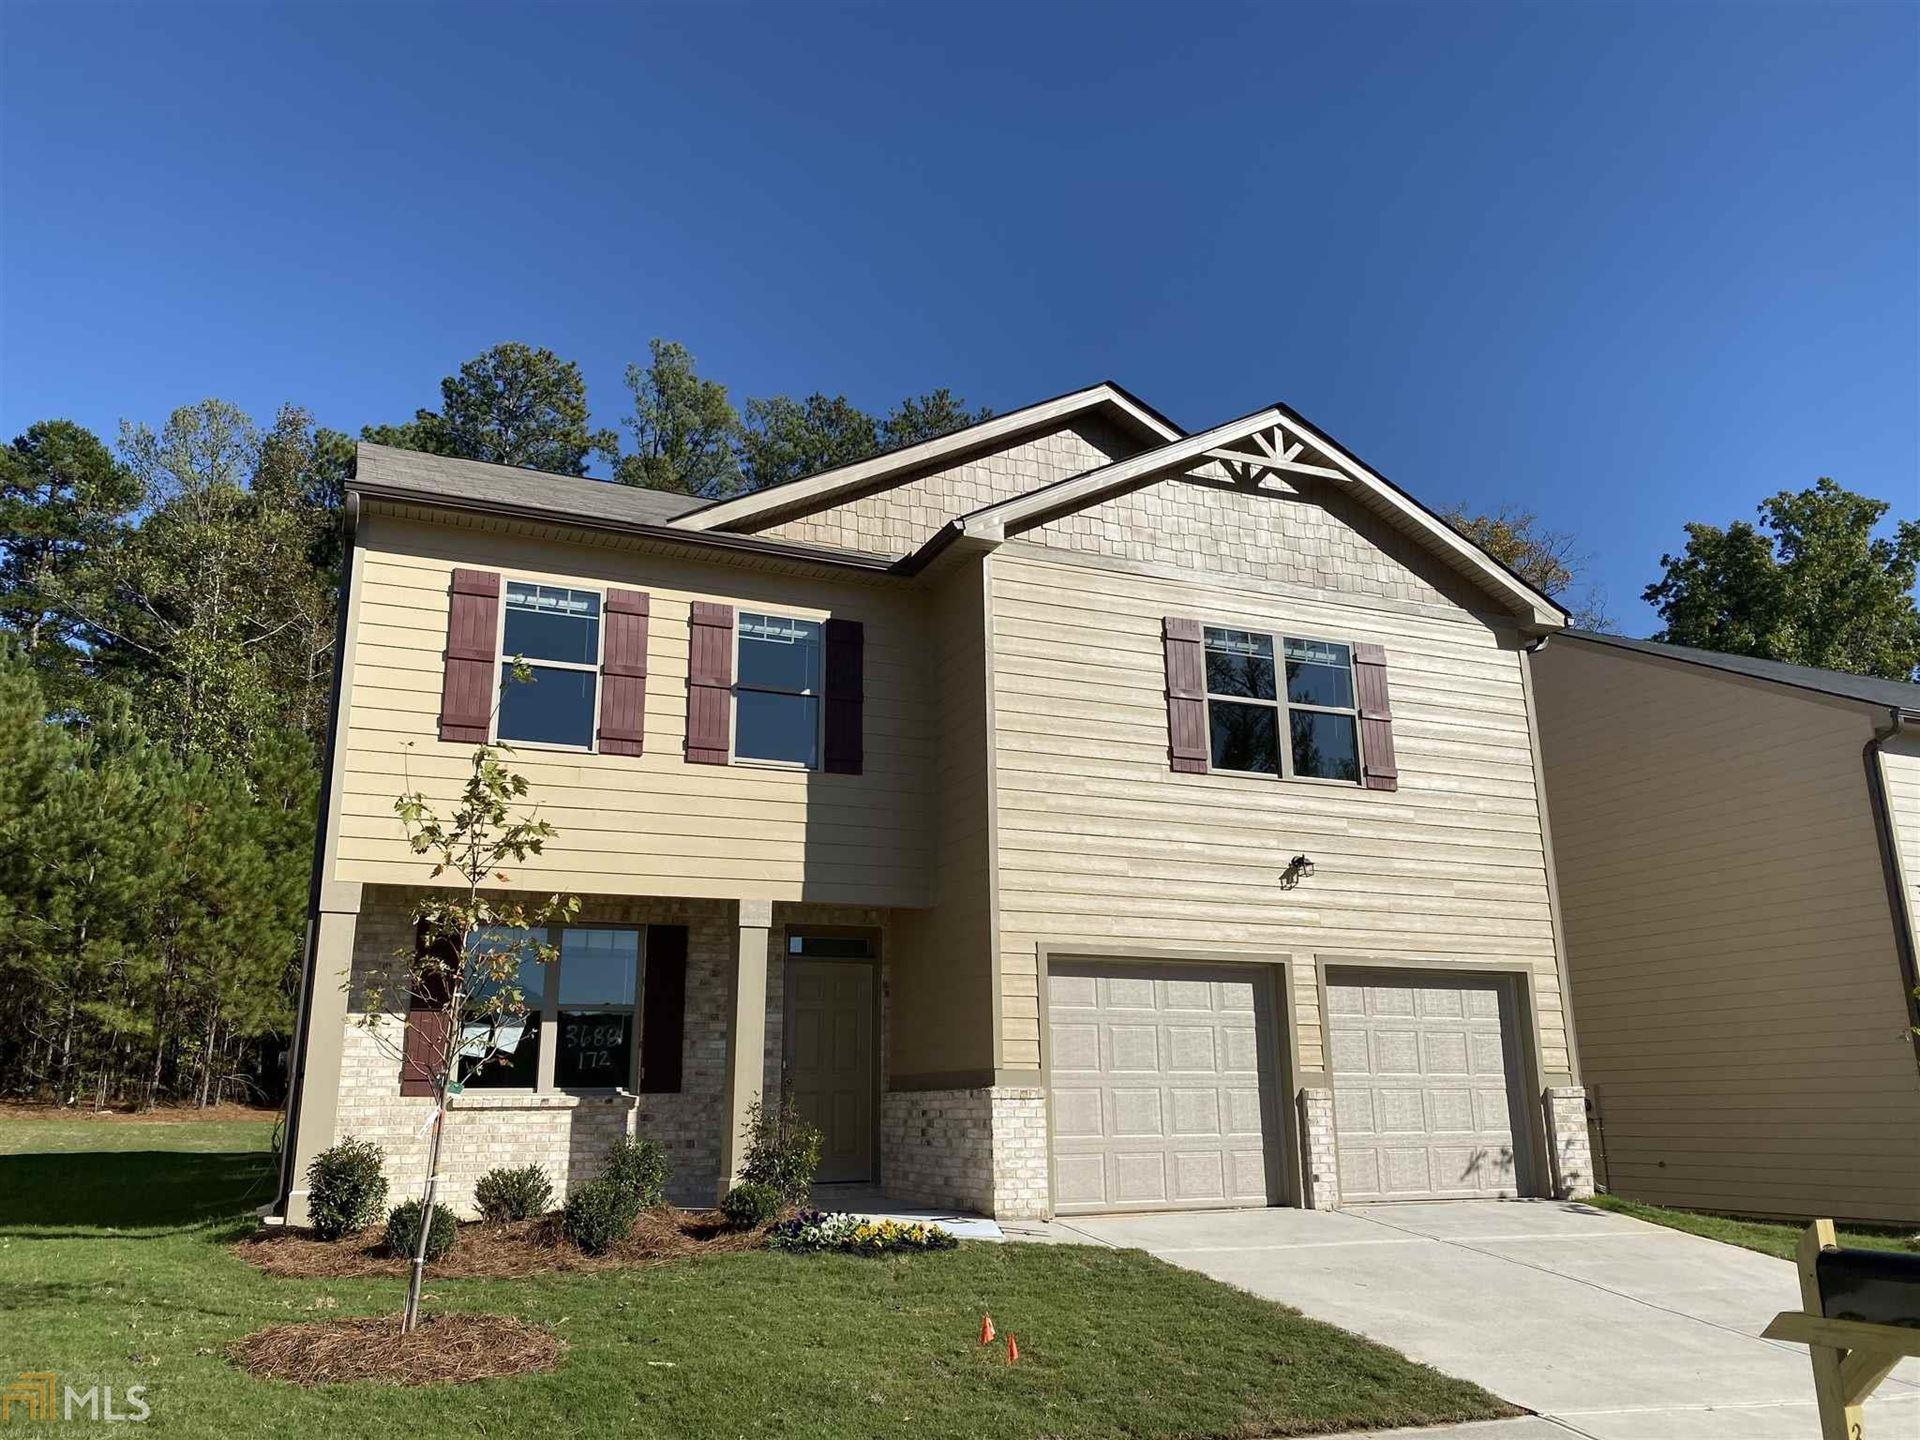 3828 River Rock Rd, Lithonia, GA 30038 - MLS#: 8864411